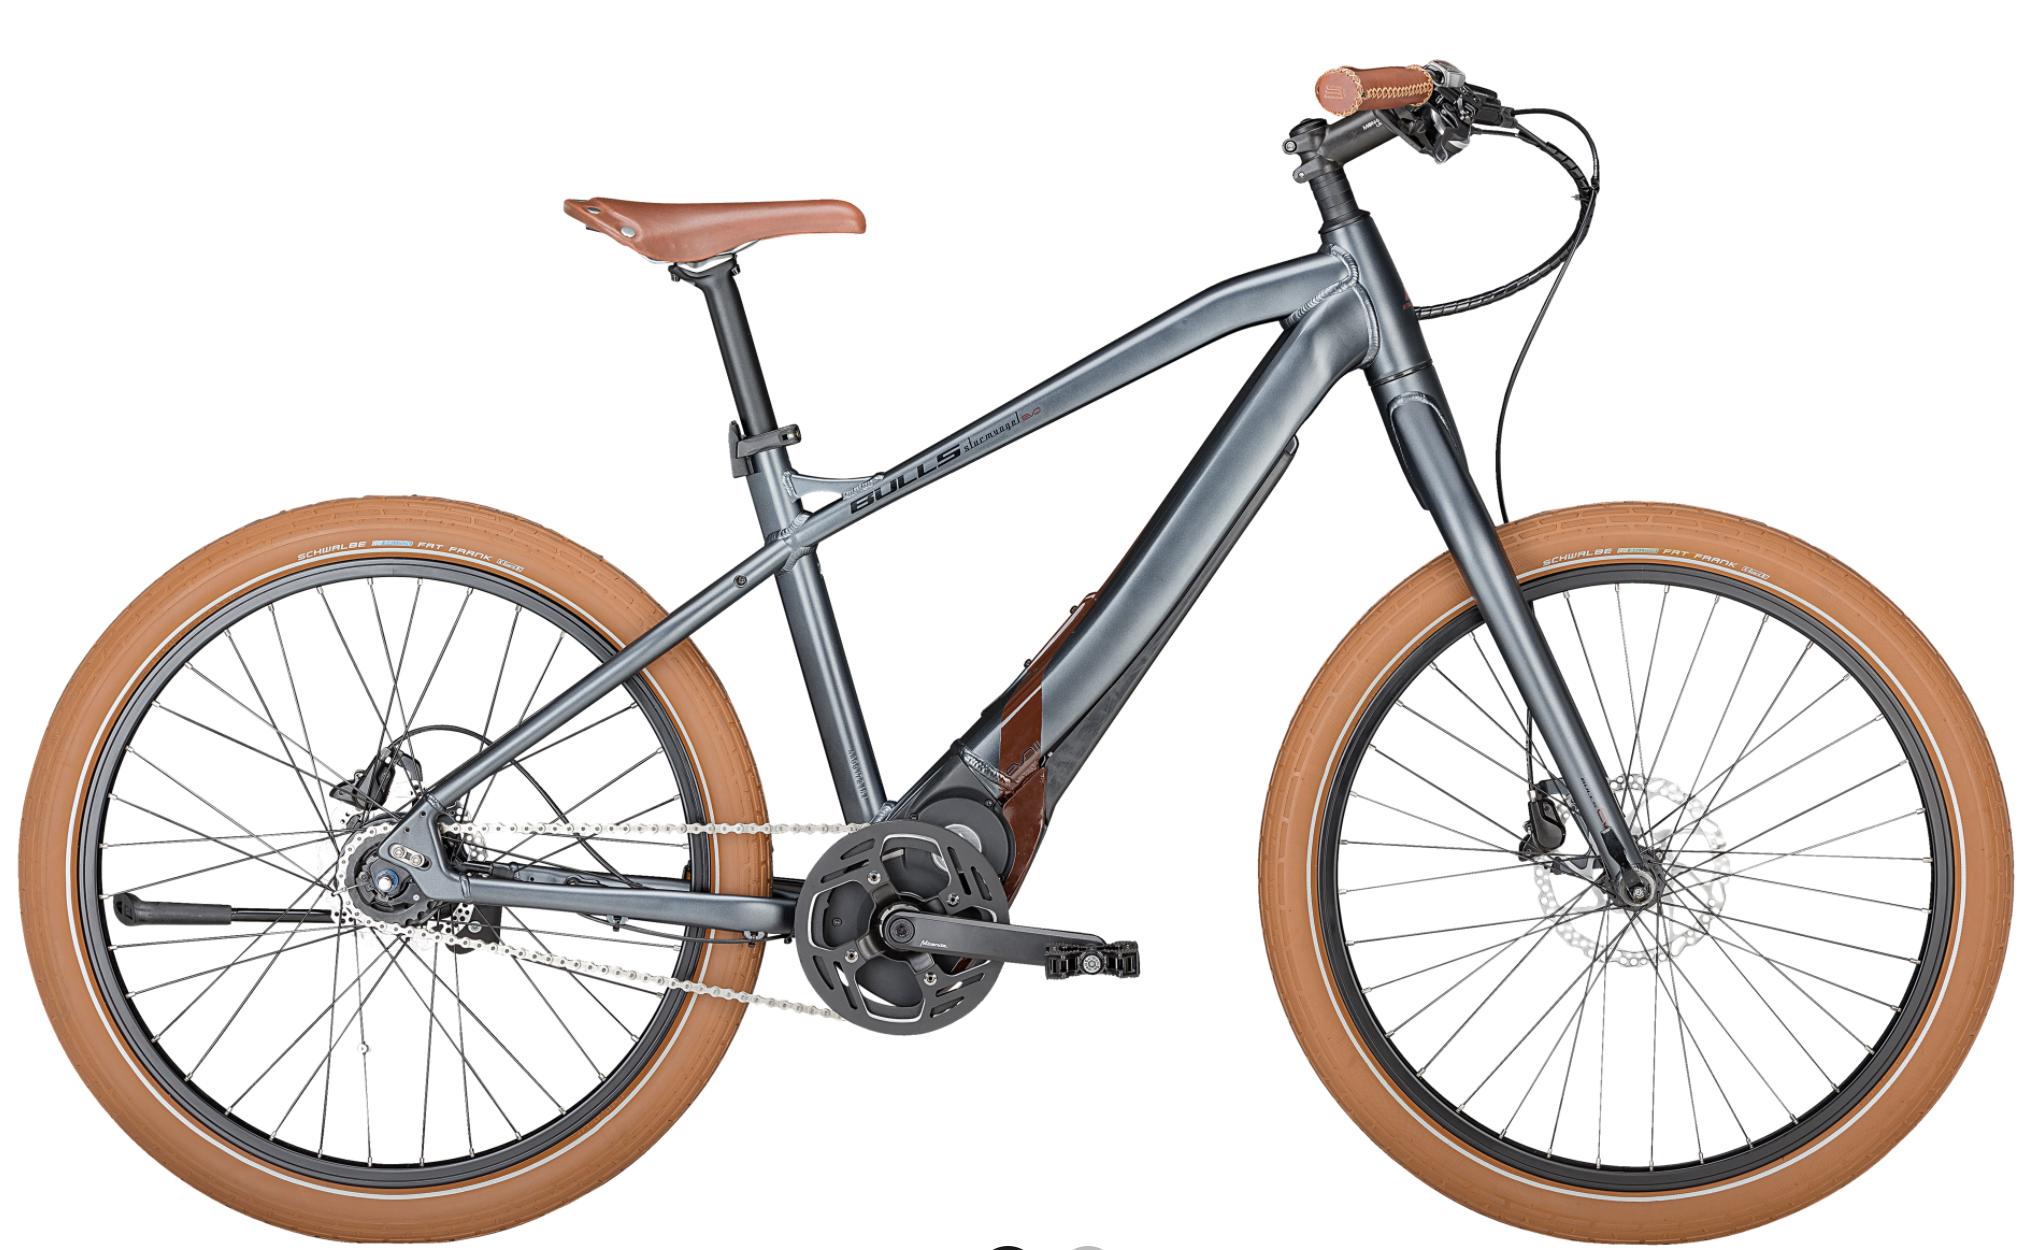 bulls sturmvogel evo 2019 pro e bike. Black Bedroom Furniture Sets. Home Design Ideas